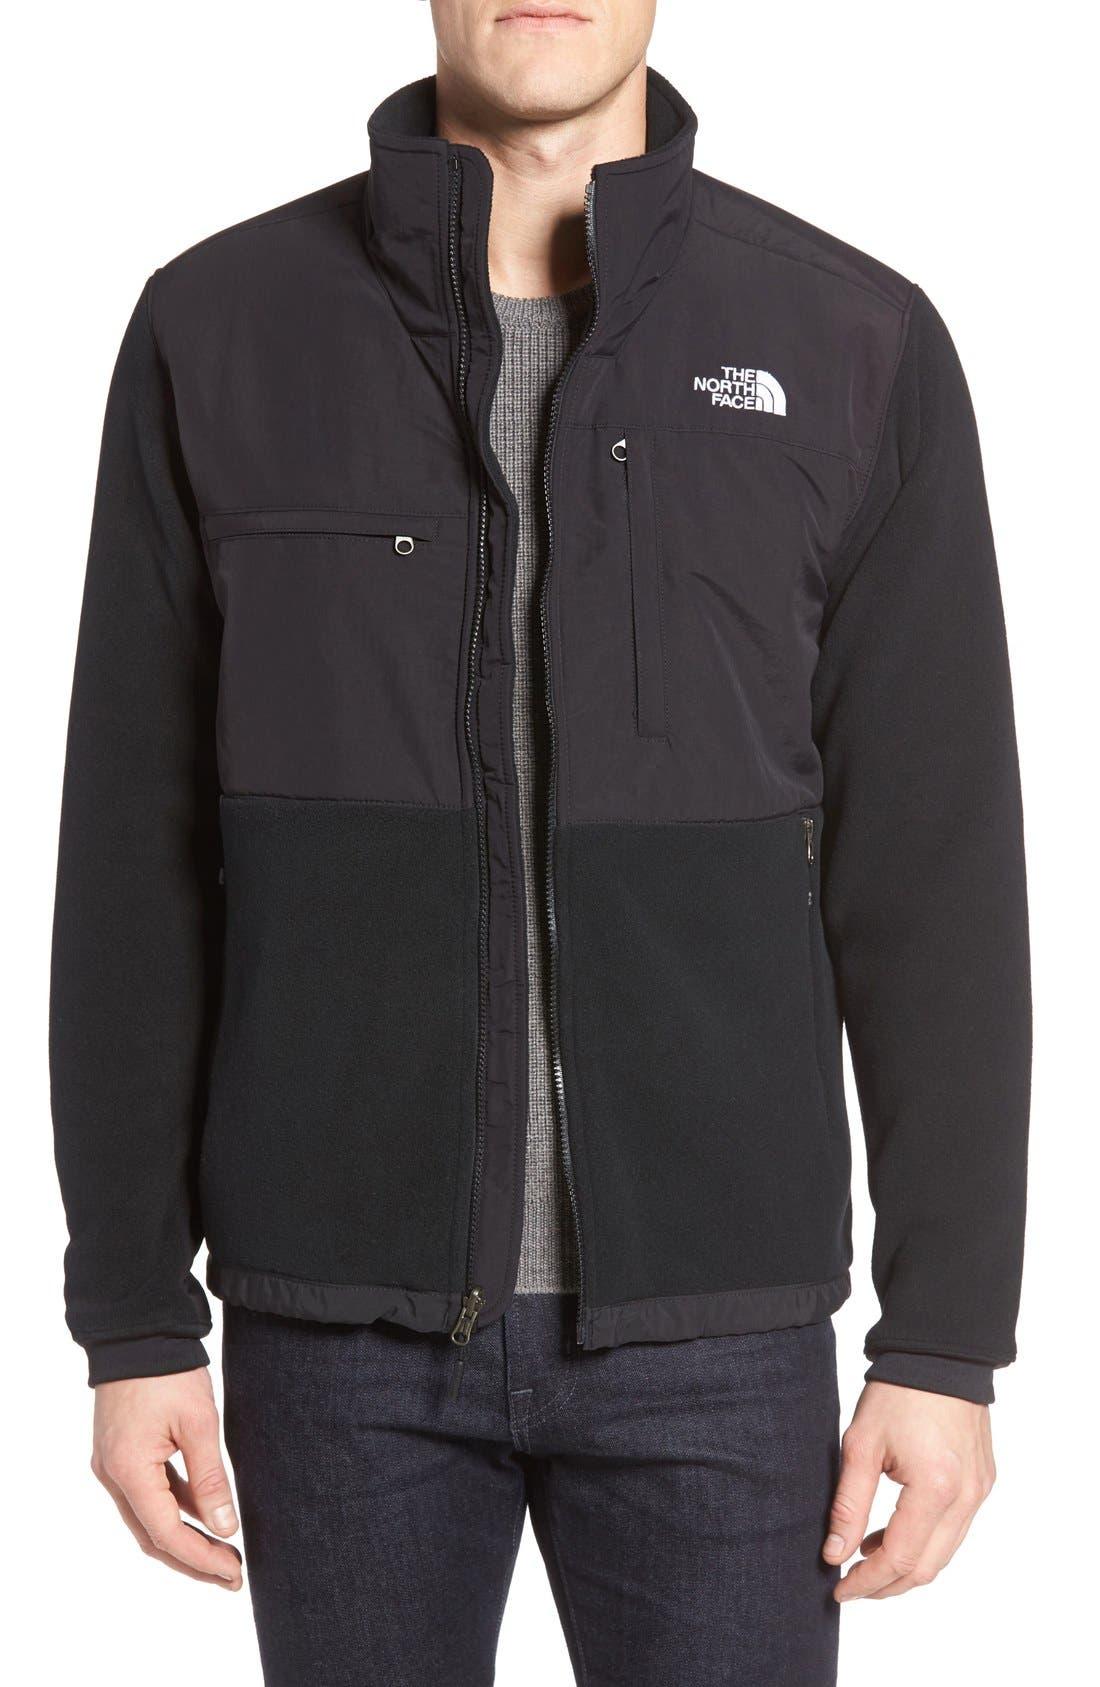 Denali 2 Recycled Fleece Jacket,                         Main,                         color, 001